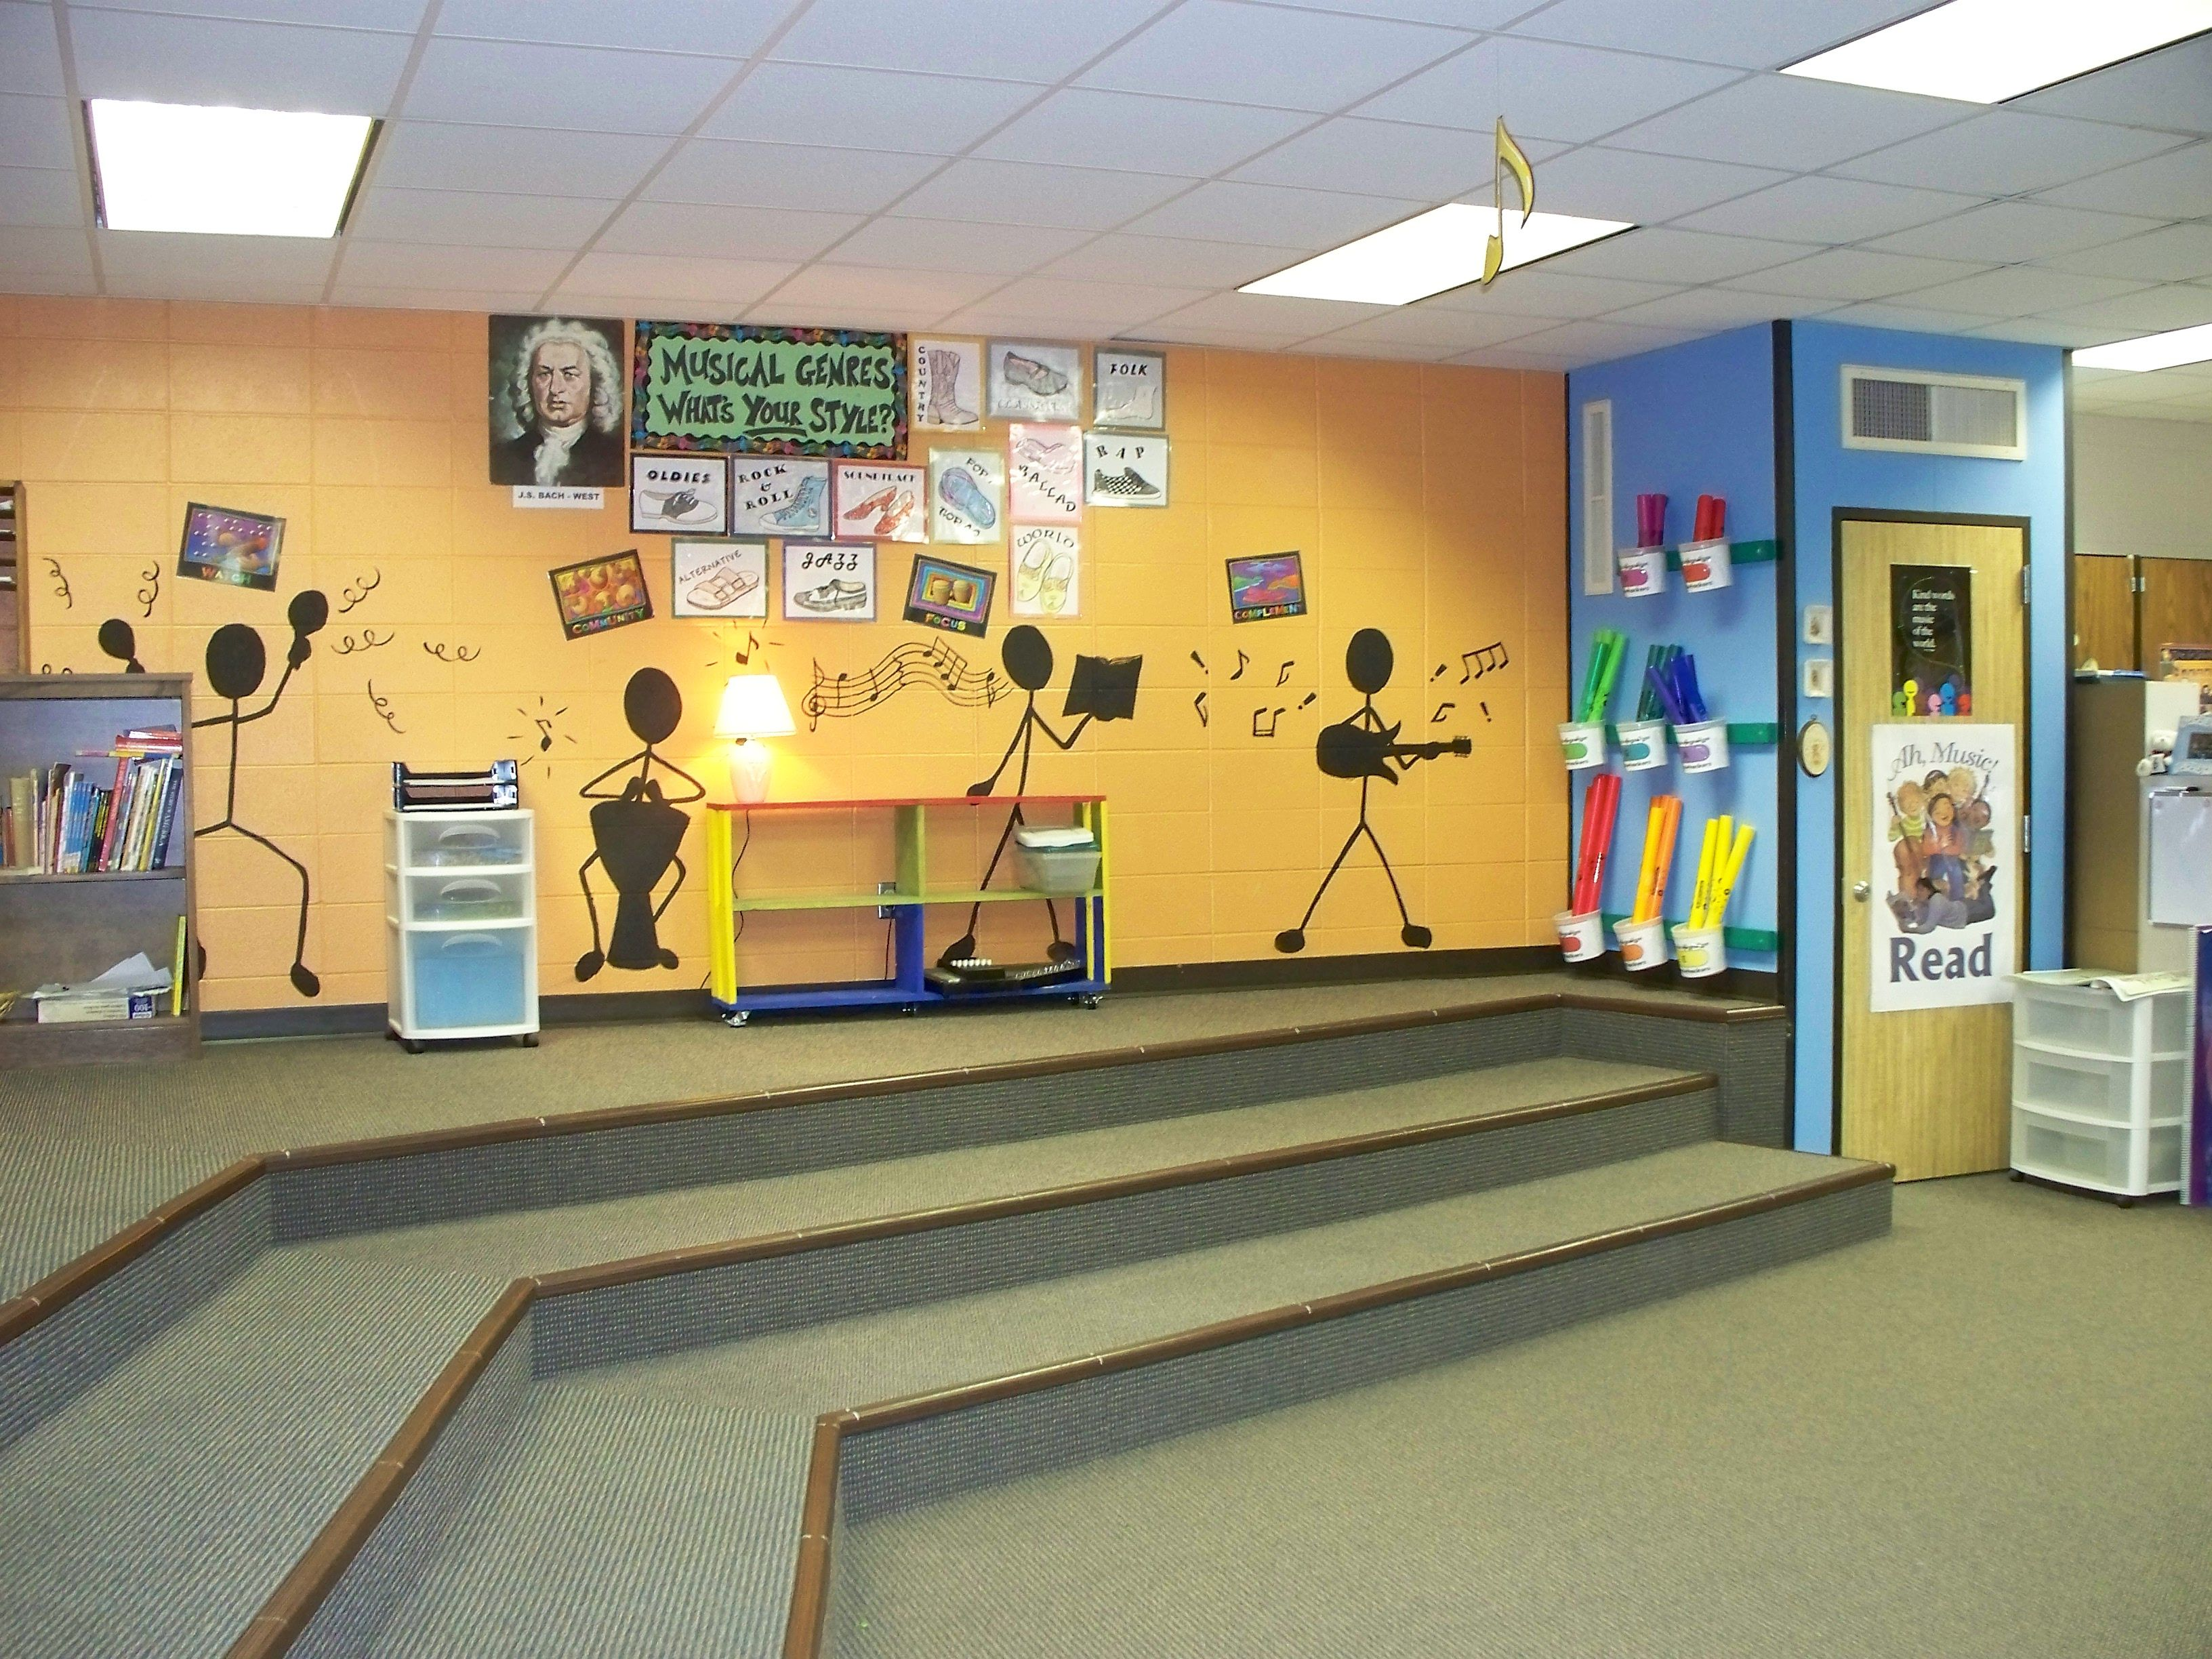 Music Classroom Decoration Ideas : Music room organization idea i classroom